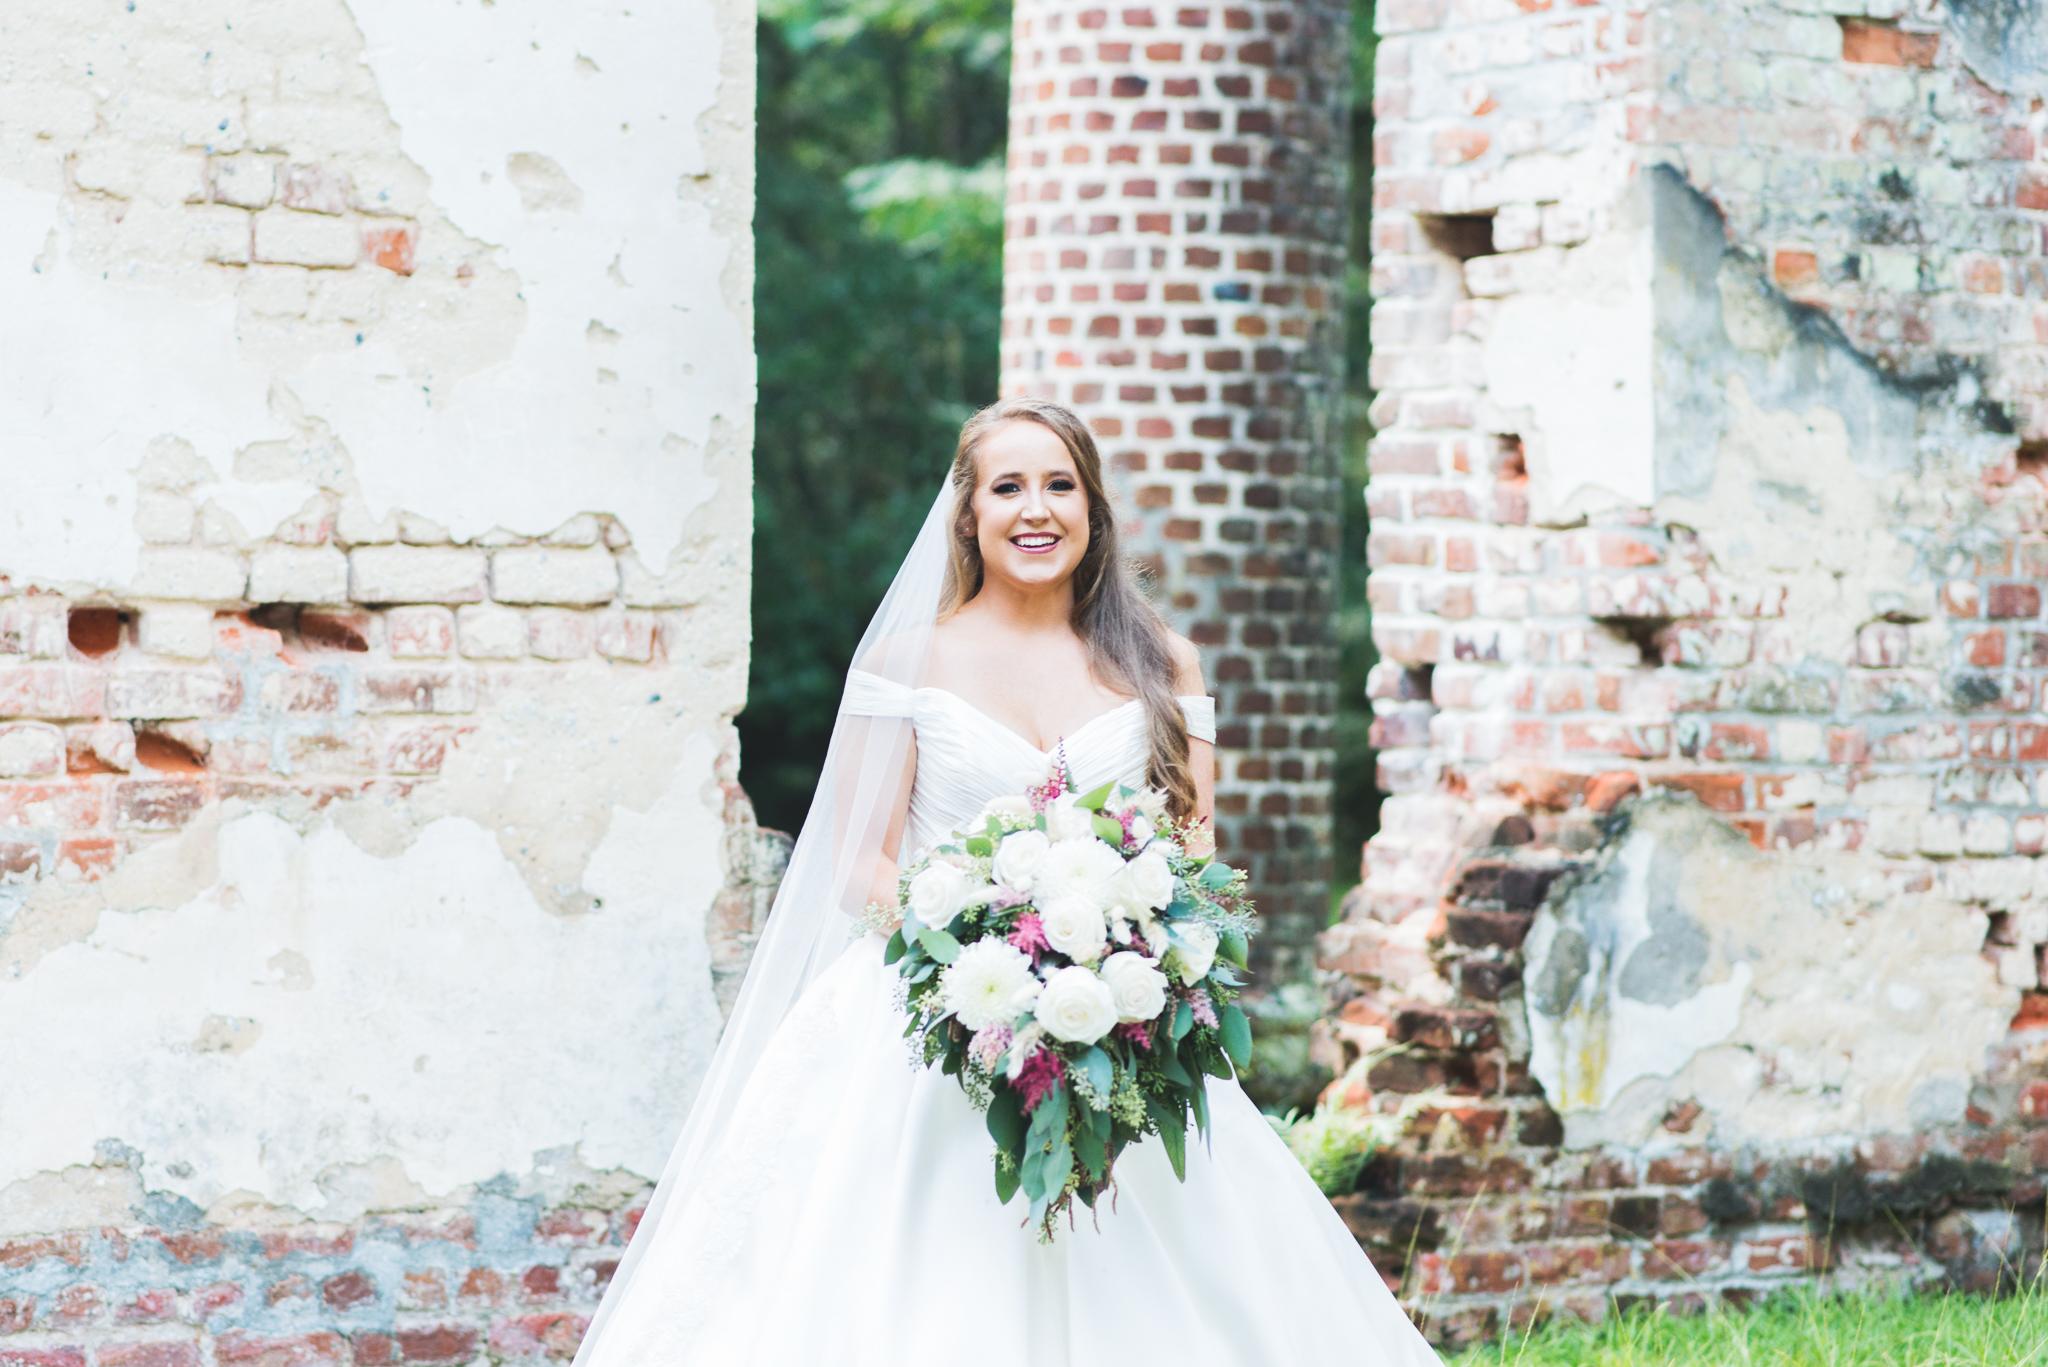 Bridals_AmberRay_blog-11.jpg